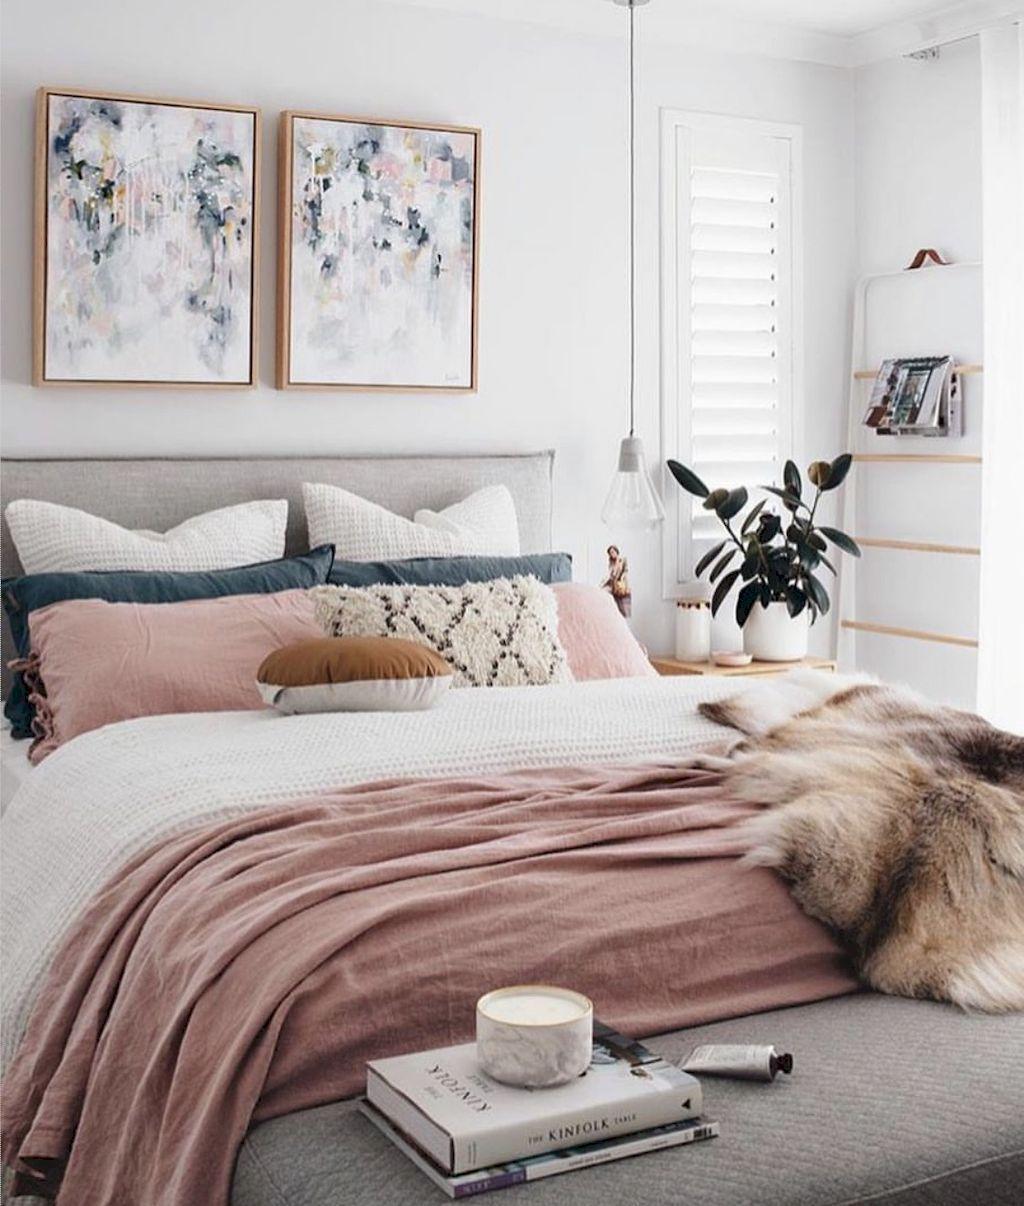 22 small apartment bedroom decor ideas | Pinterest